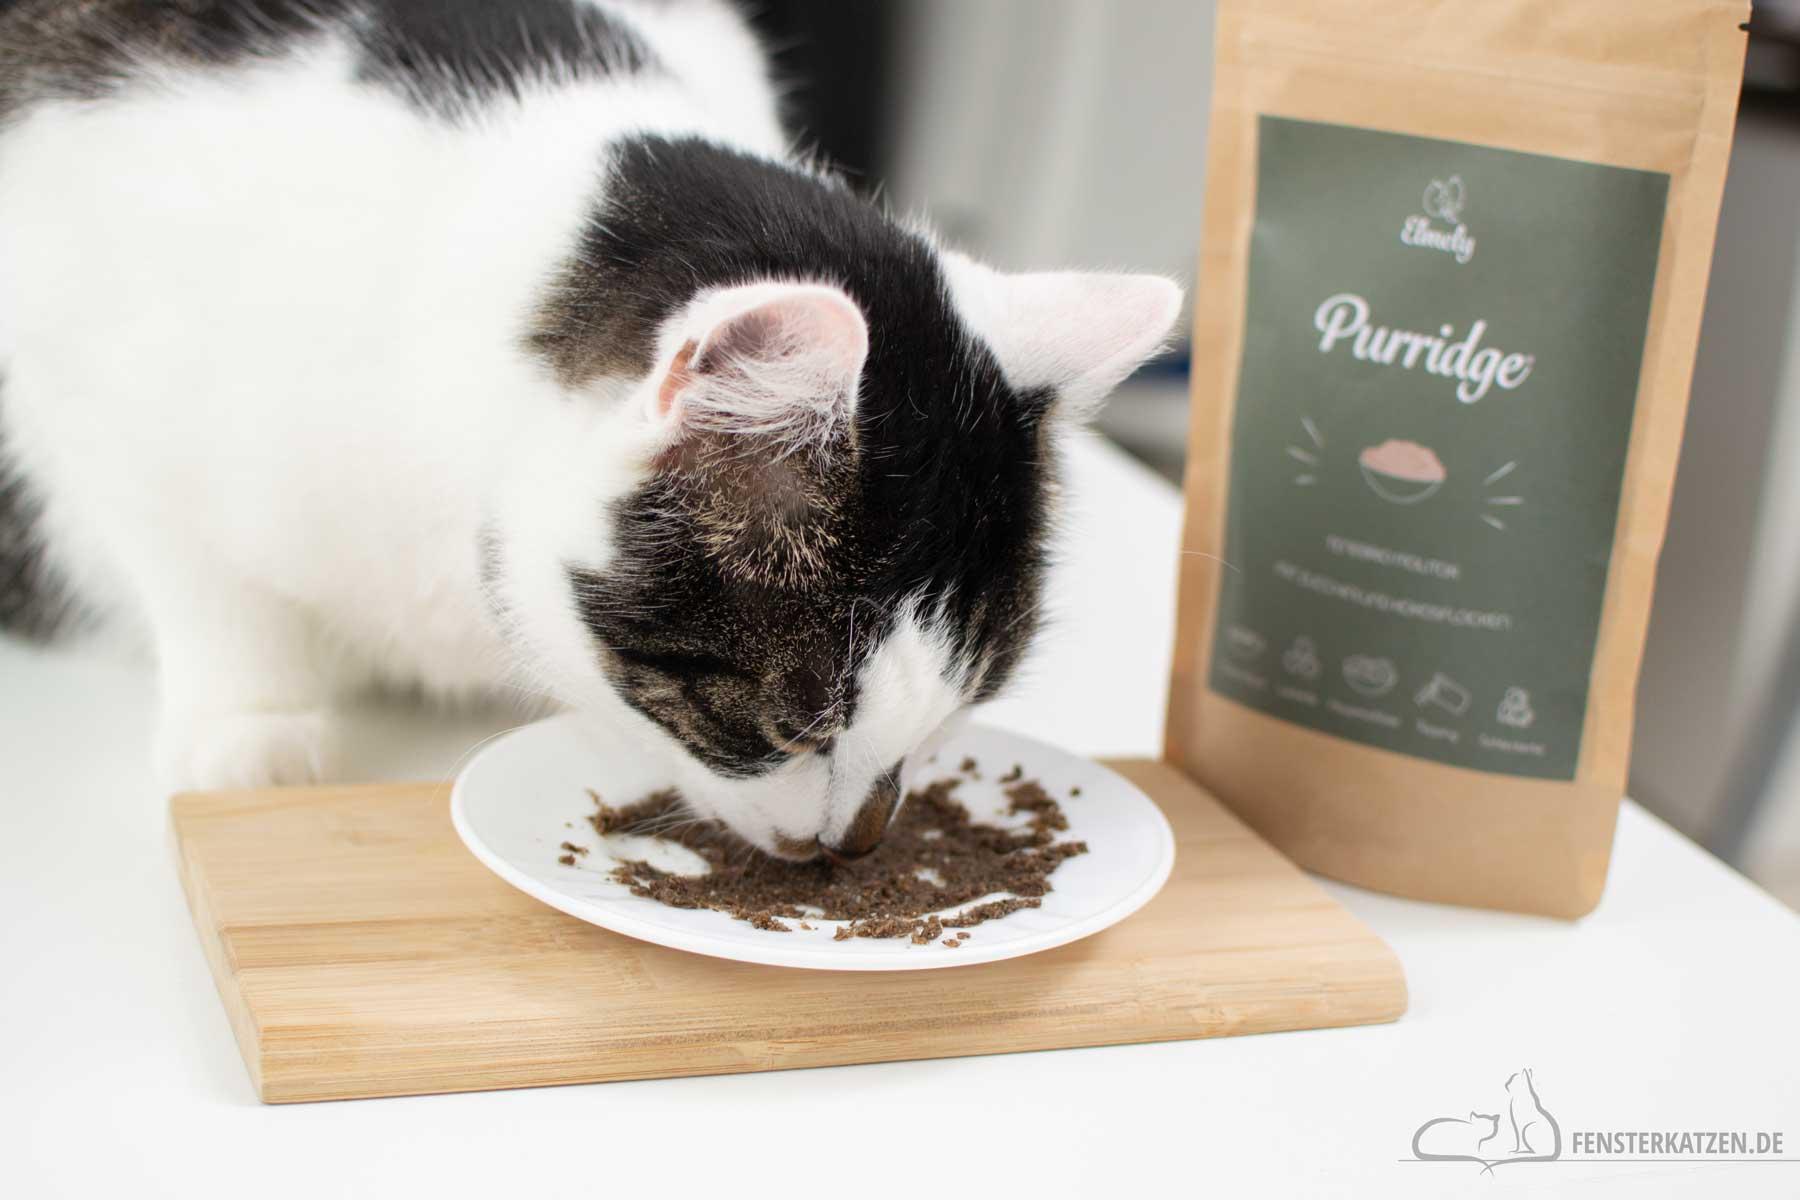 Fensterkatzen-Katzenblog-Getestet-Insekten-Katzenfutter-Purridge-Elmely-Kater-frisst